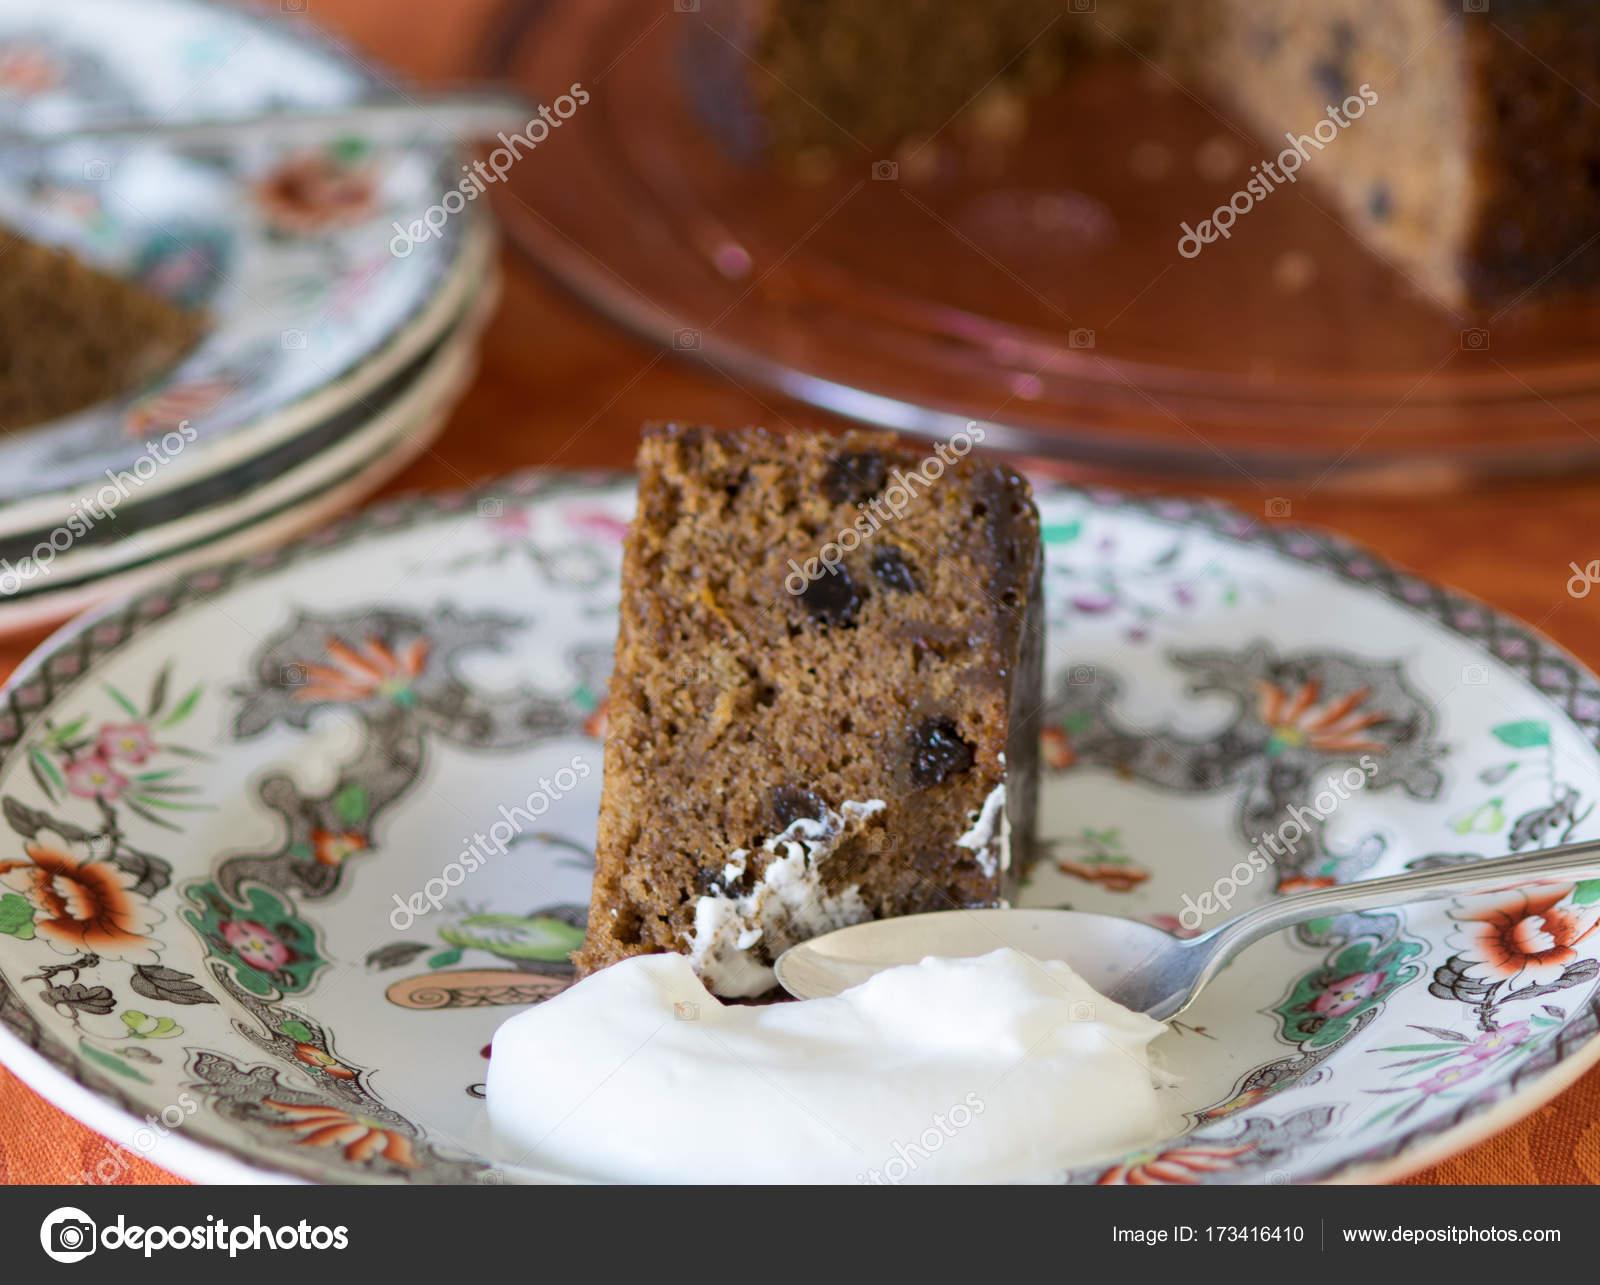 Gingersnap Pudding Kuchen Ubrig Gebliebenen Gingersnap Platzchen